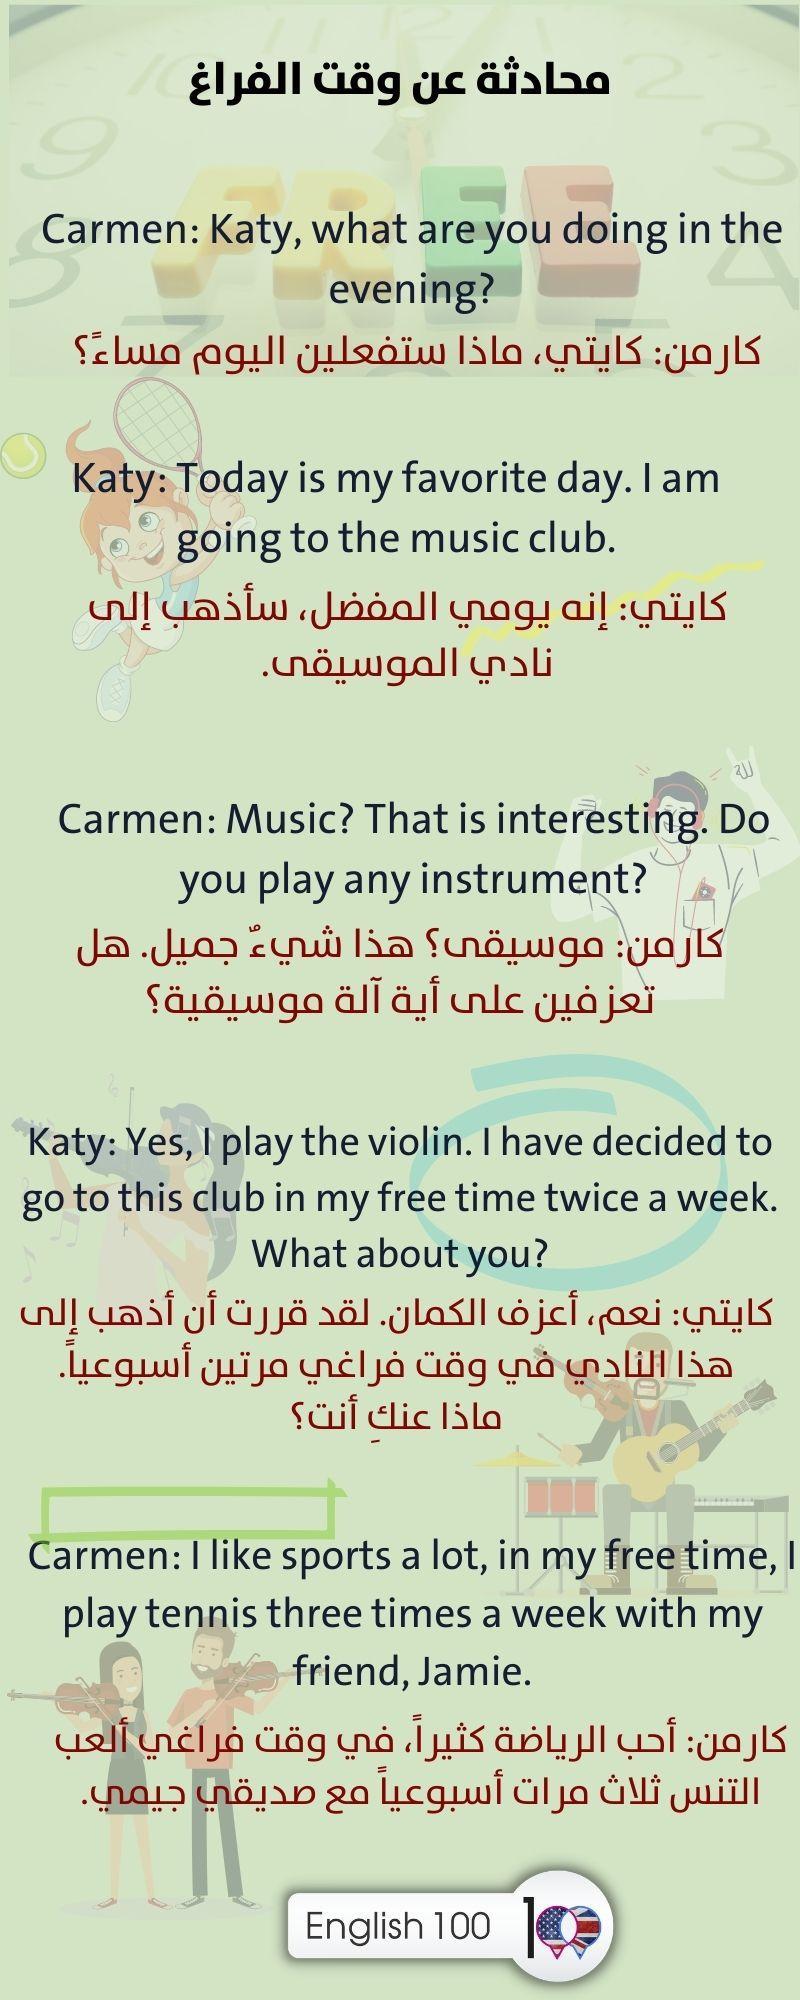 محادثه بالانجليزي بين شخصين عن وقت الفراغ A conversation in English between two persons about free time